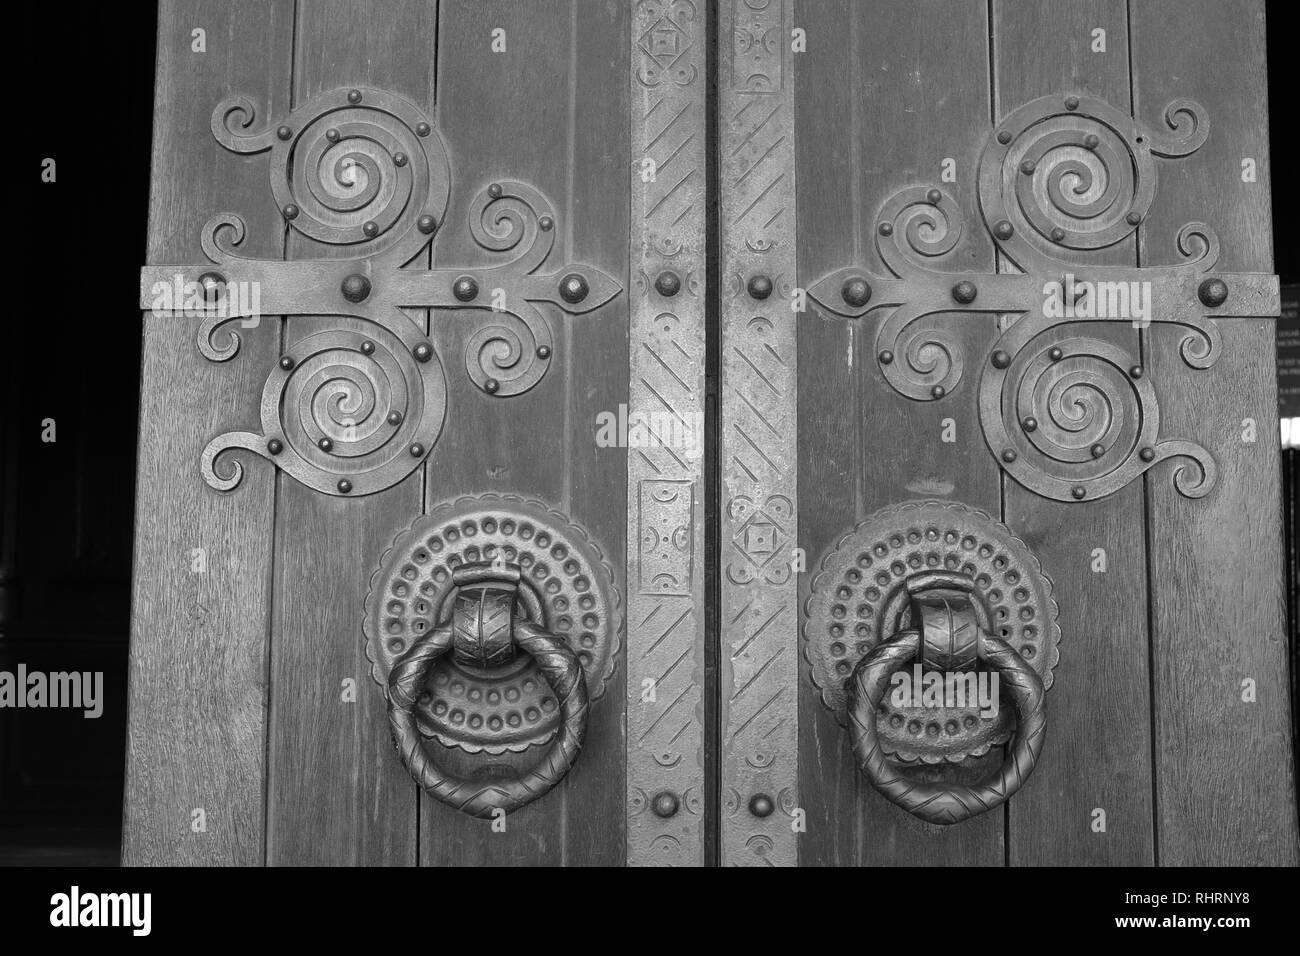 Lisbon Cathedral Ornate Medieval Doors Spiral Hinges and Hooped Handles Santa Maria Major Alfama Area Lisbon Portugal - Stock Image